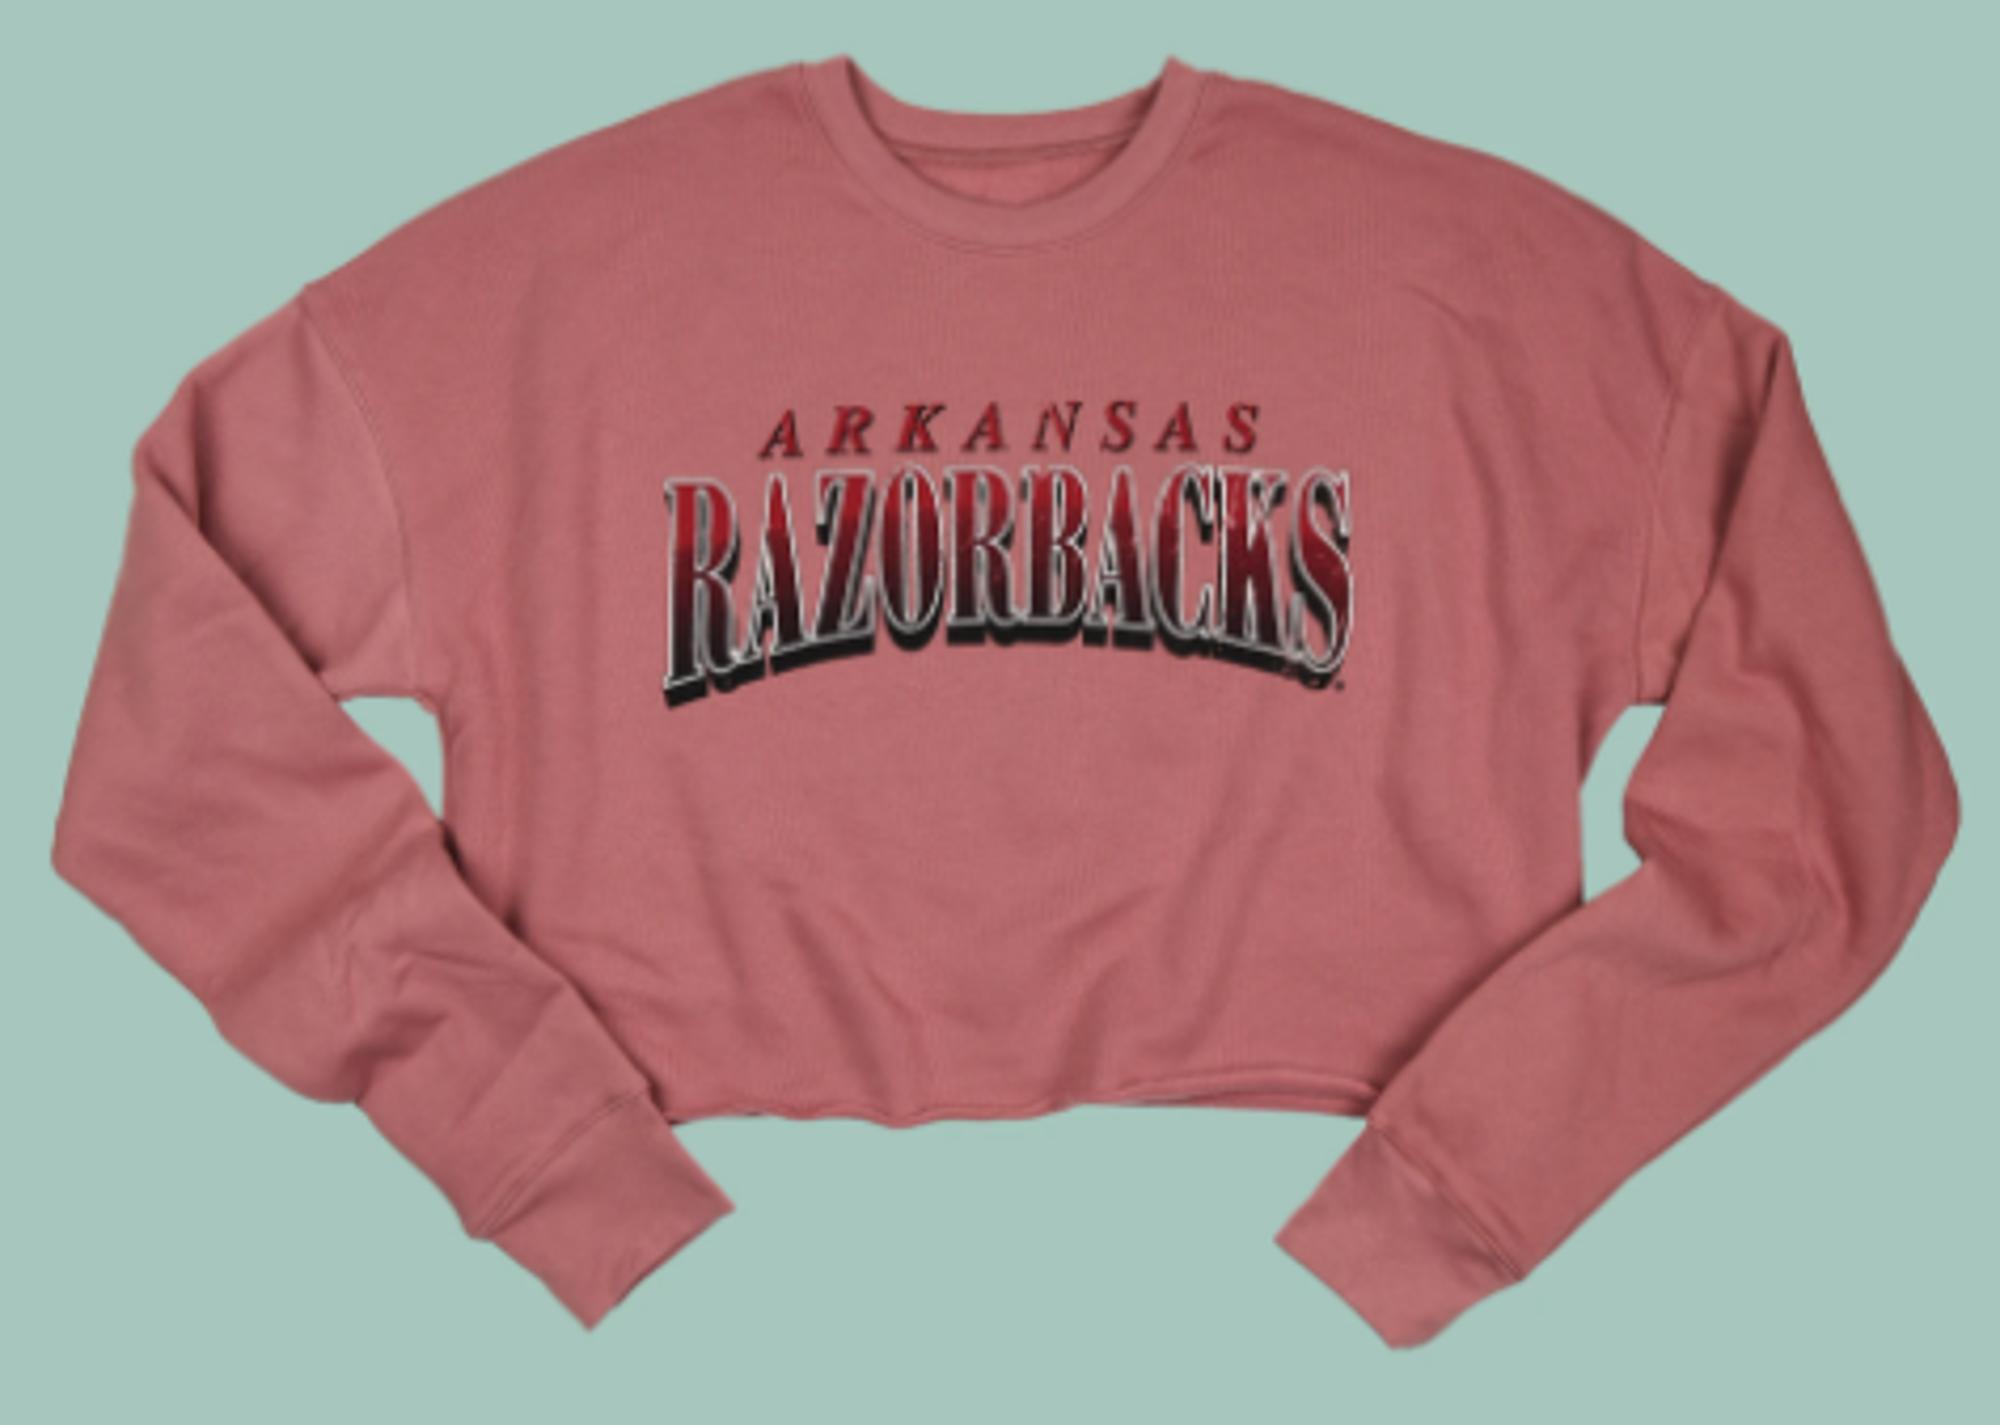 image of: Arkansas Razorbacks Women's Distressed Collegiate Crop Sweatshirt